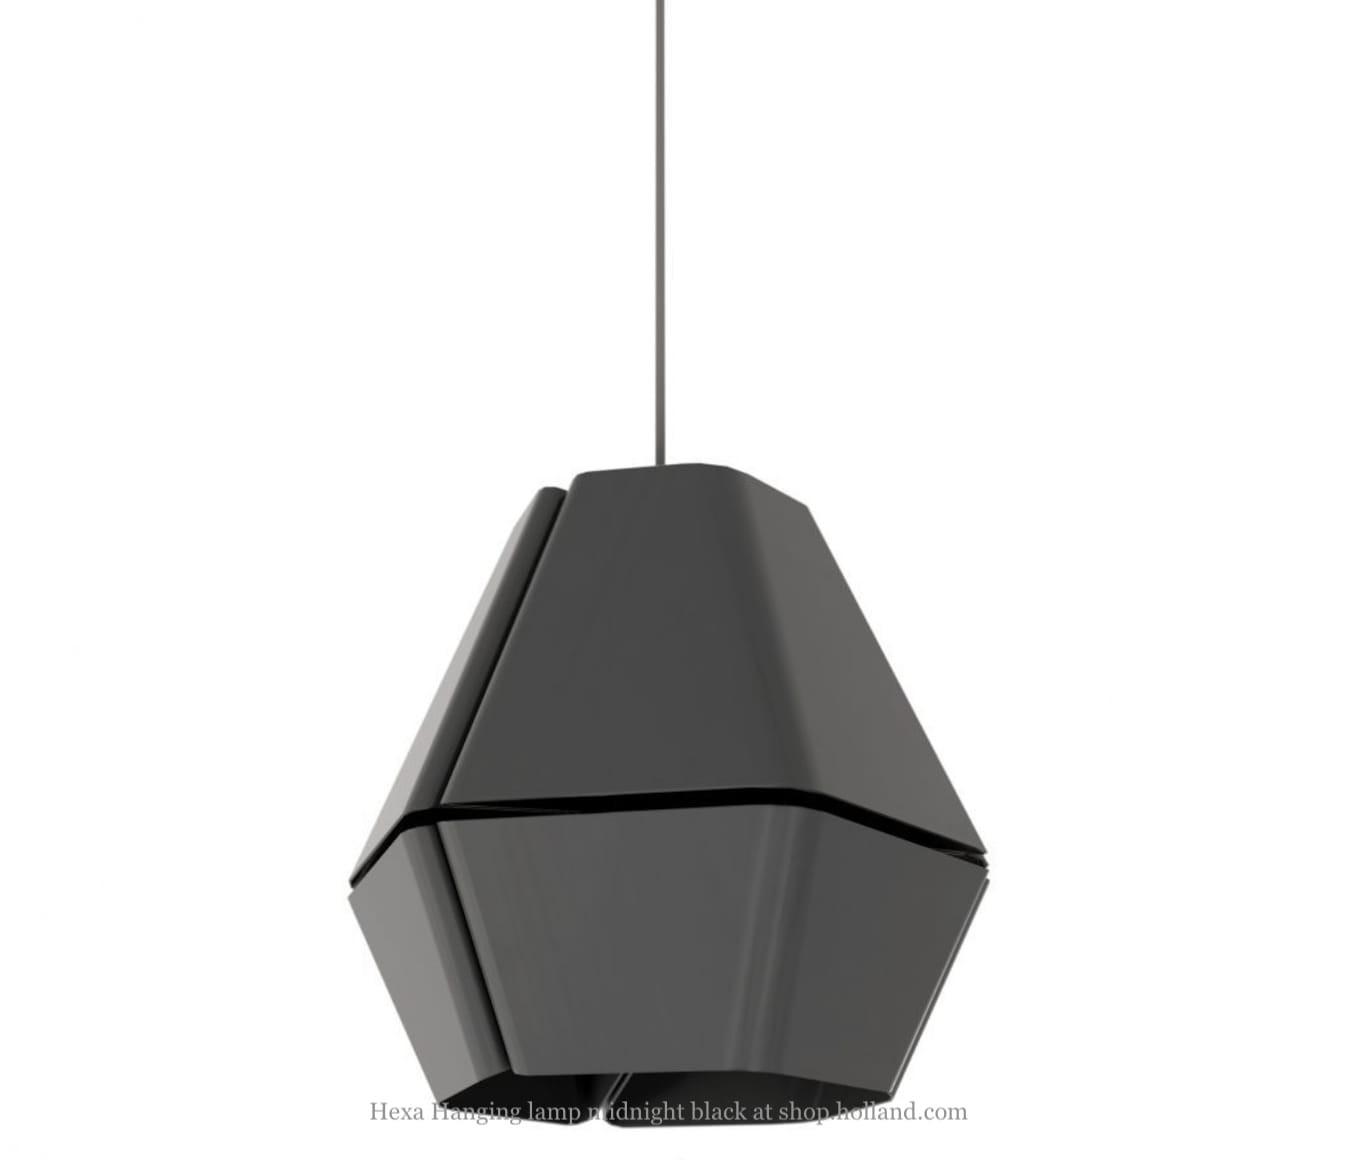 Hexa Pendant Lighting Midnight Black By